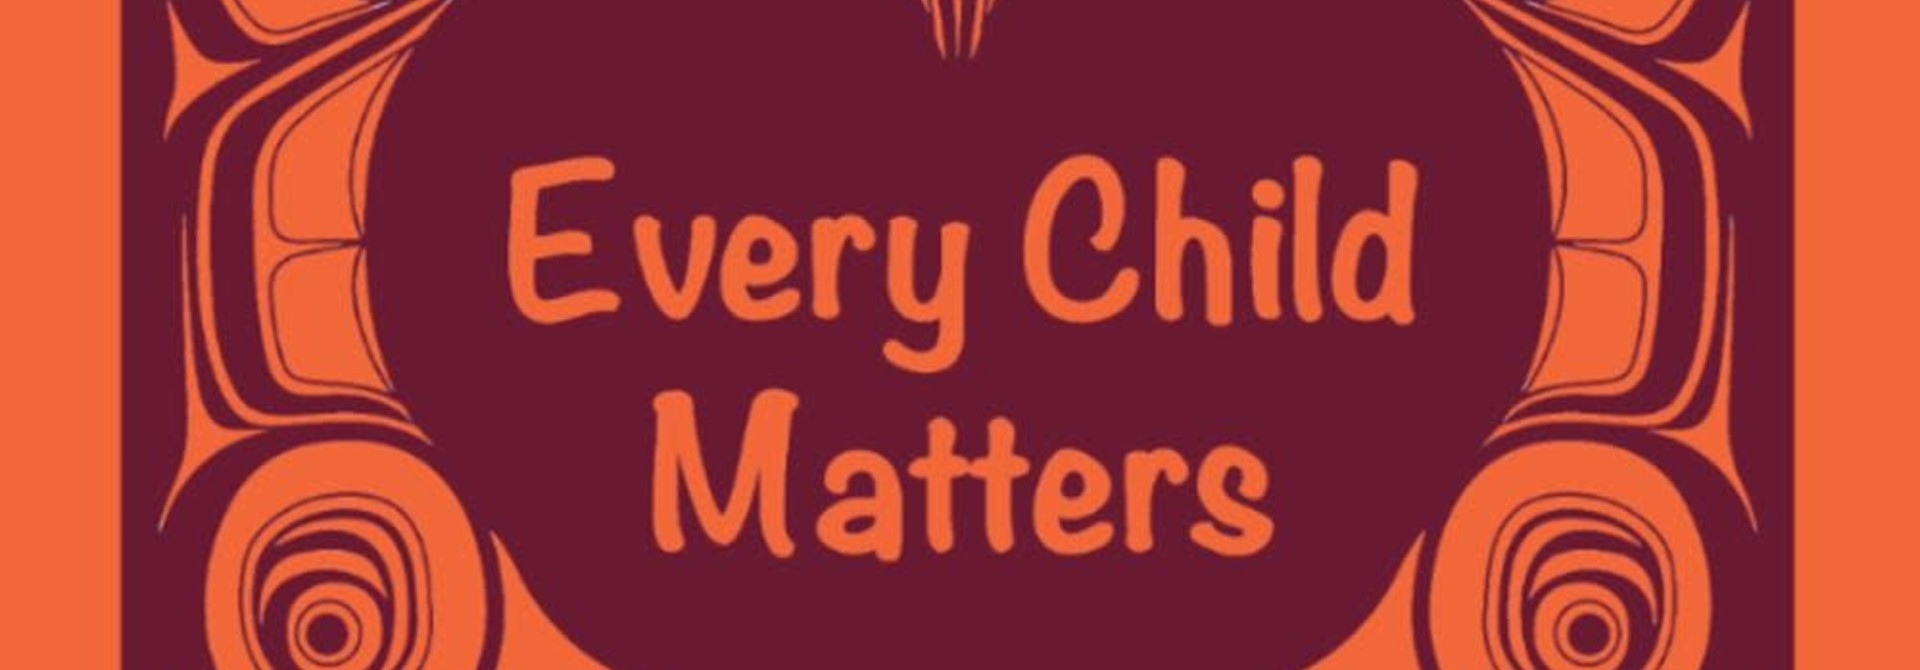 "Every Child Matters 2.5"" Sticker - strip of 5"